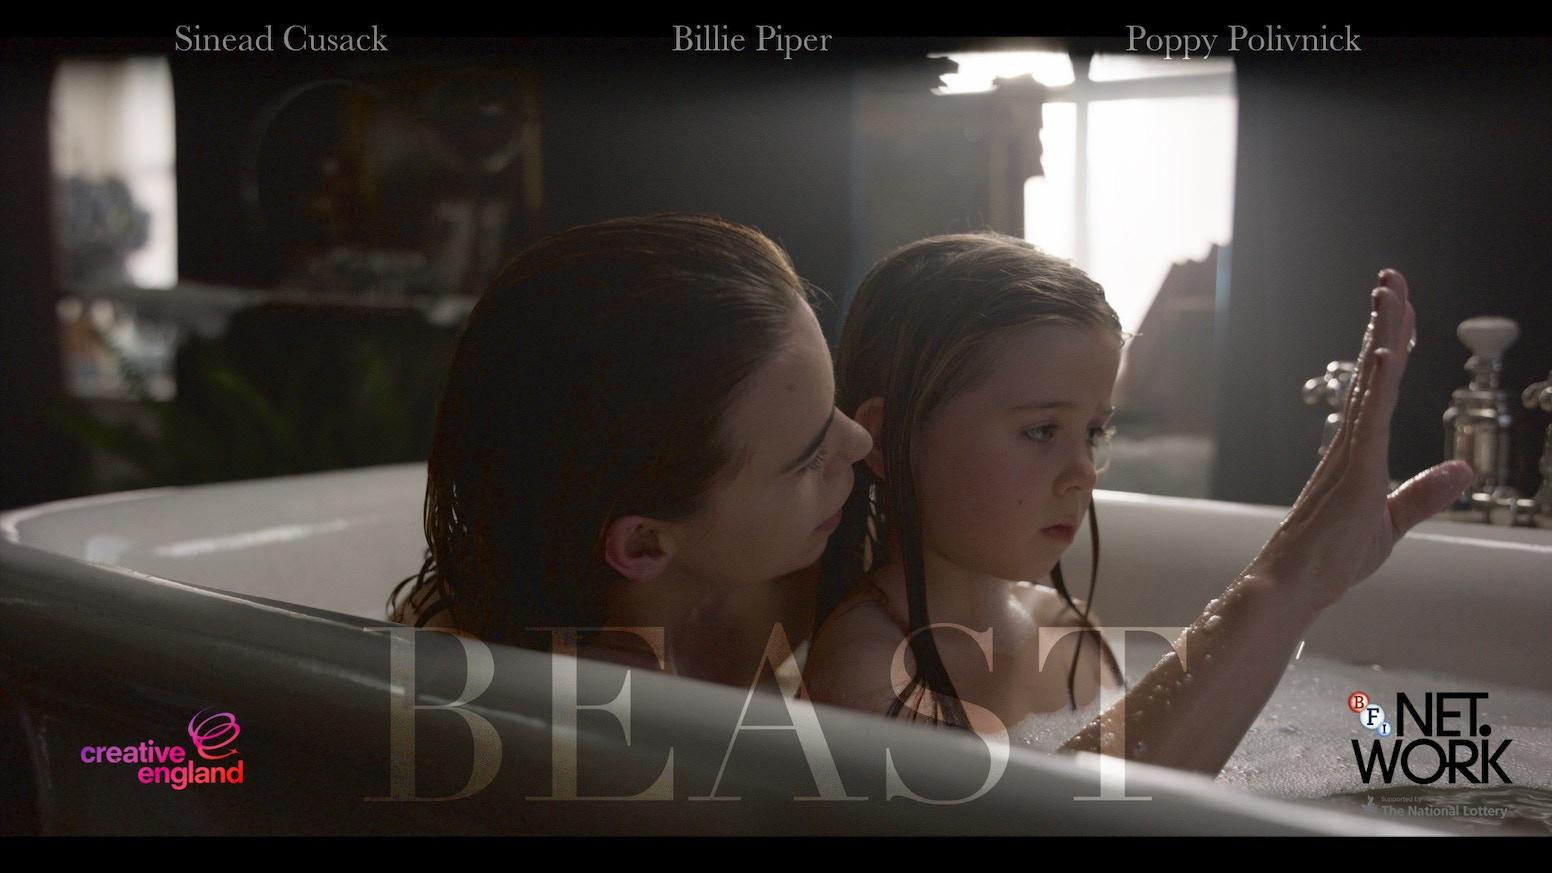 A short film starring Billie Piper, Sinead Cusack & Poppy Polivnick.  Made through Creative England's  Emerging Talent scheme.